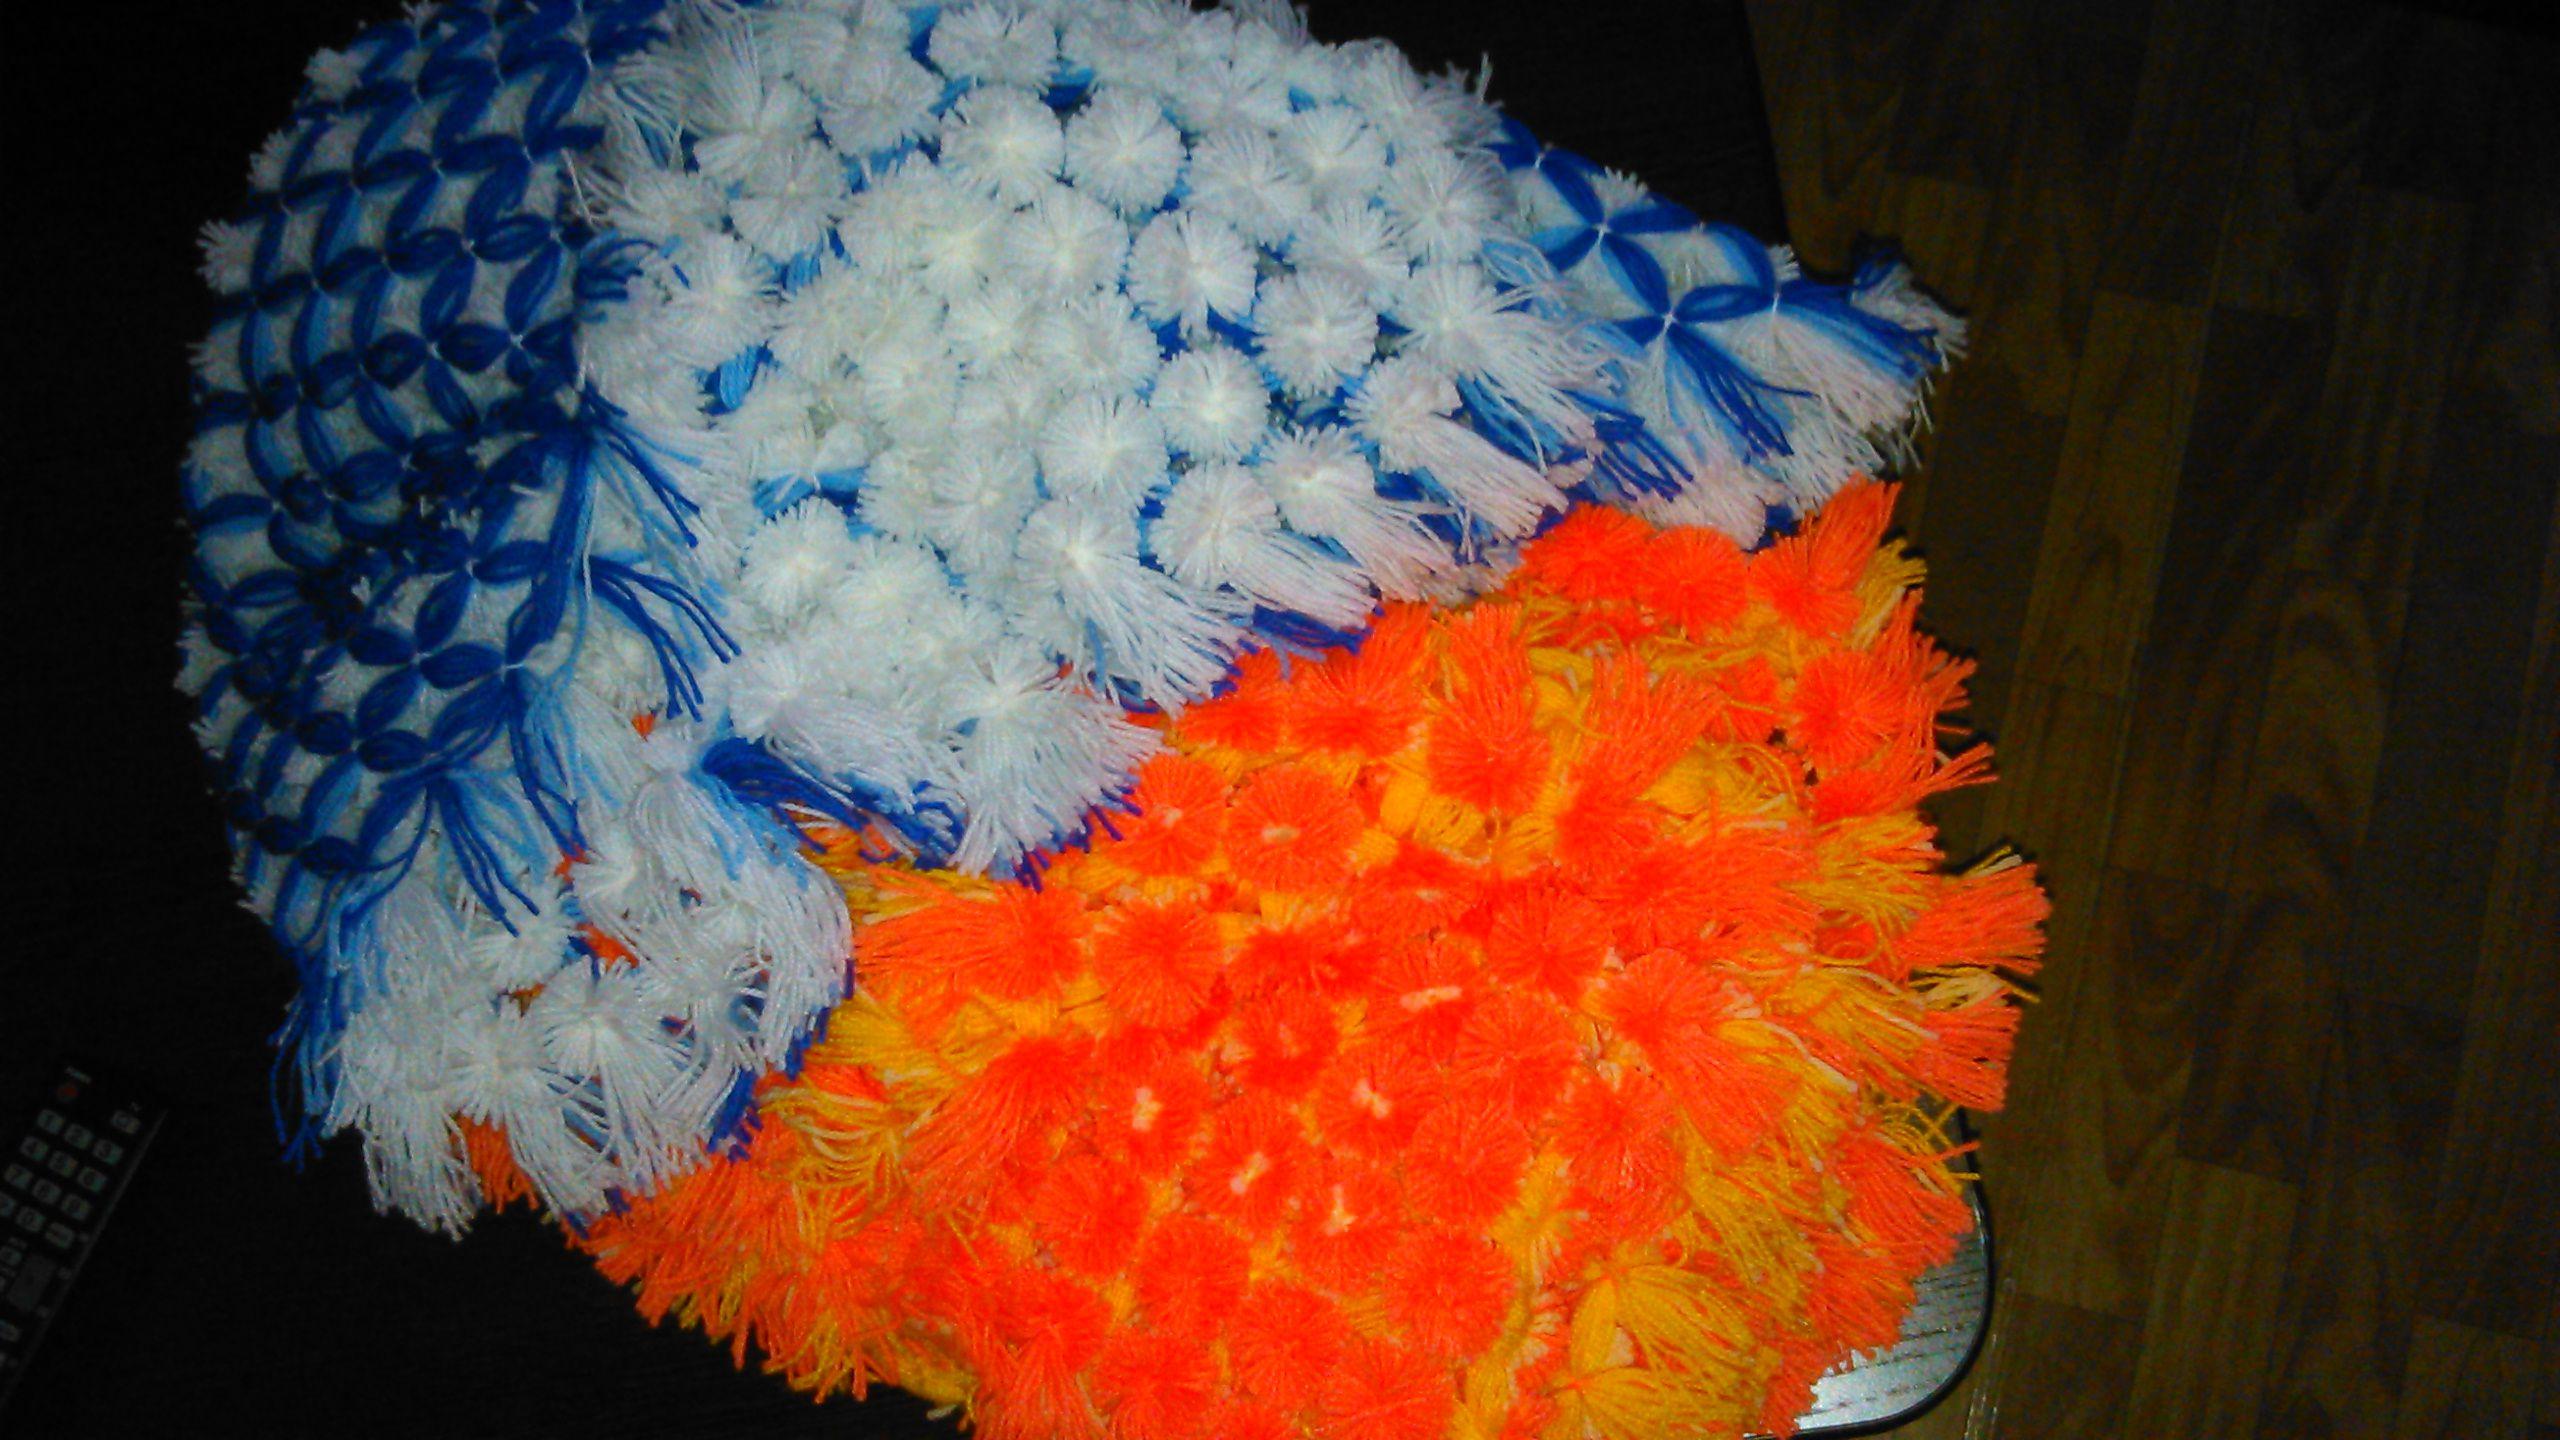 помпоны плед палантин покрывало хендмейд конверт шарф пряжа